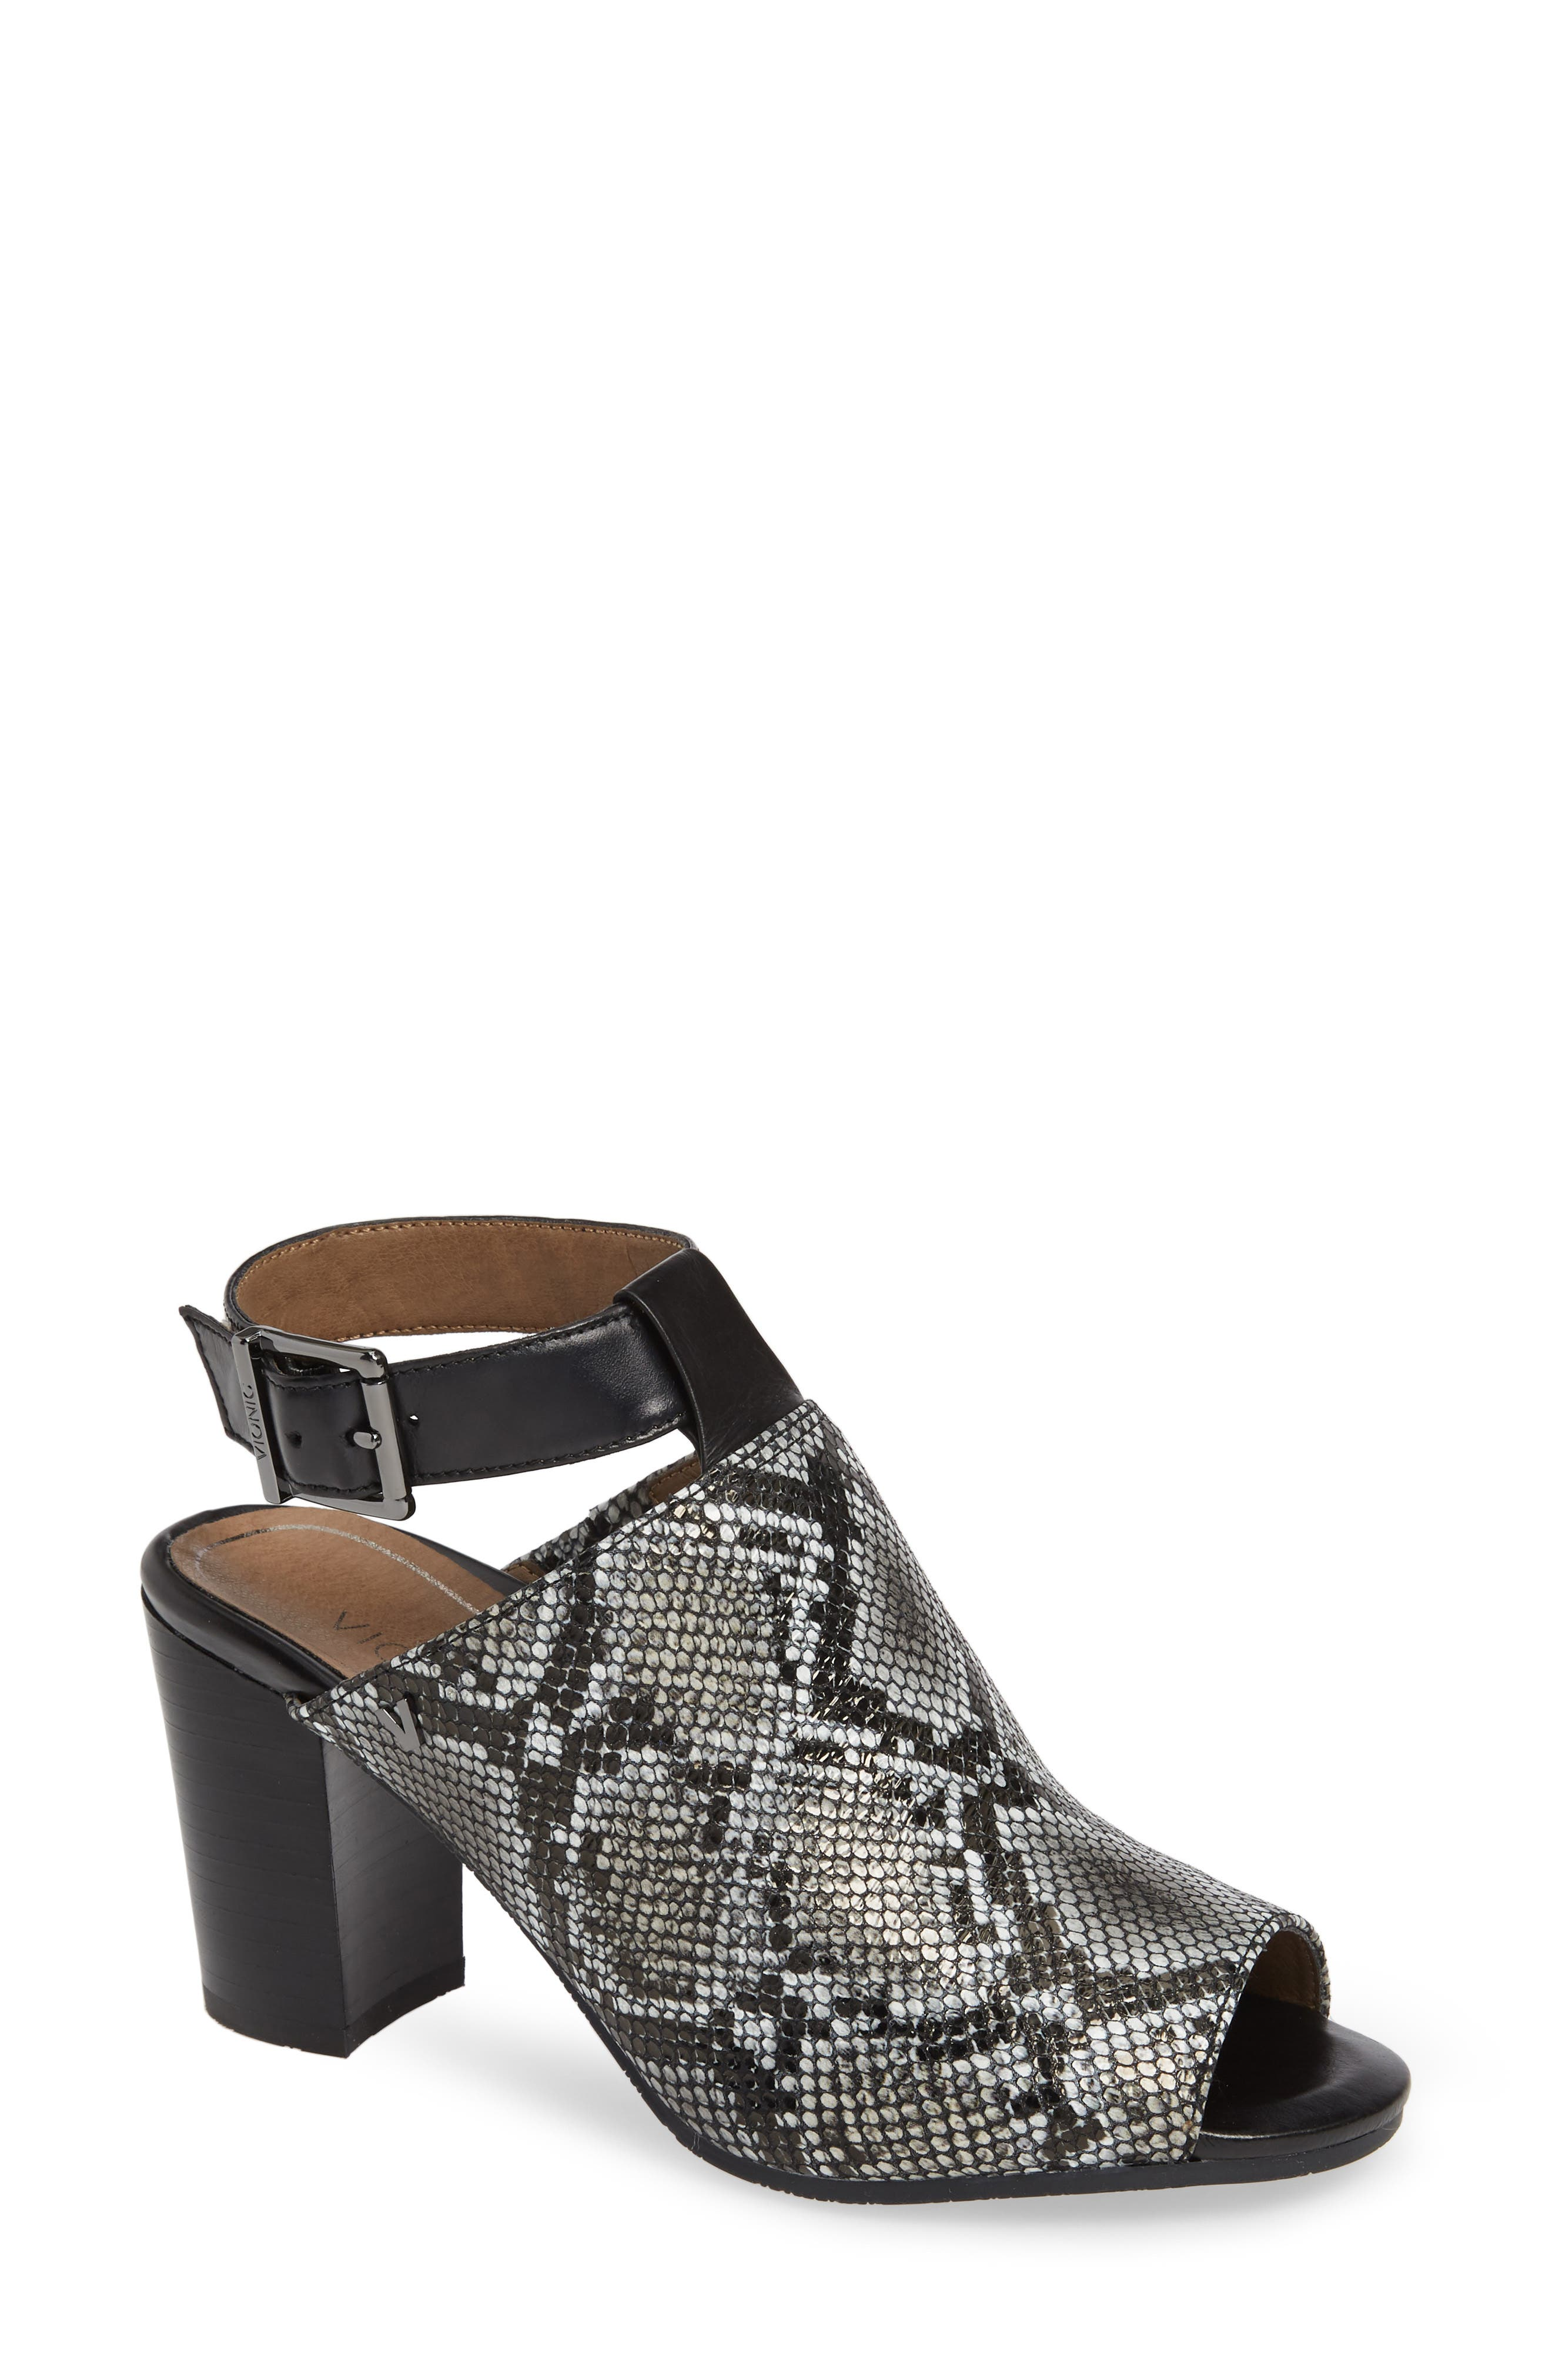 039742e1515 Women s Vionic Comfortable Heels   Comfortable Pumps